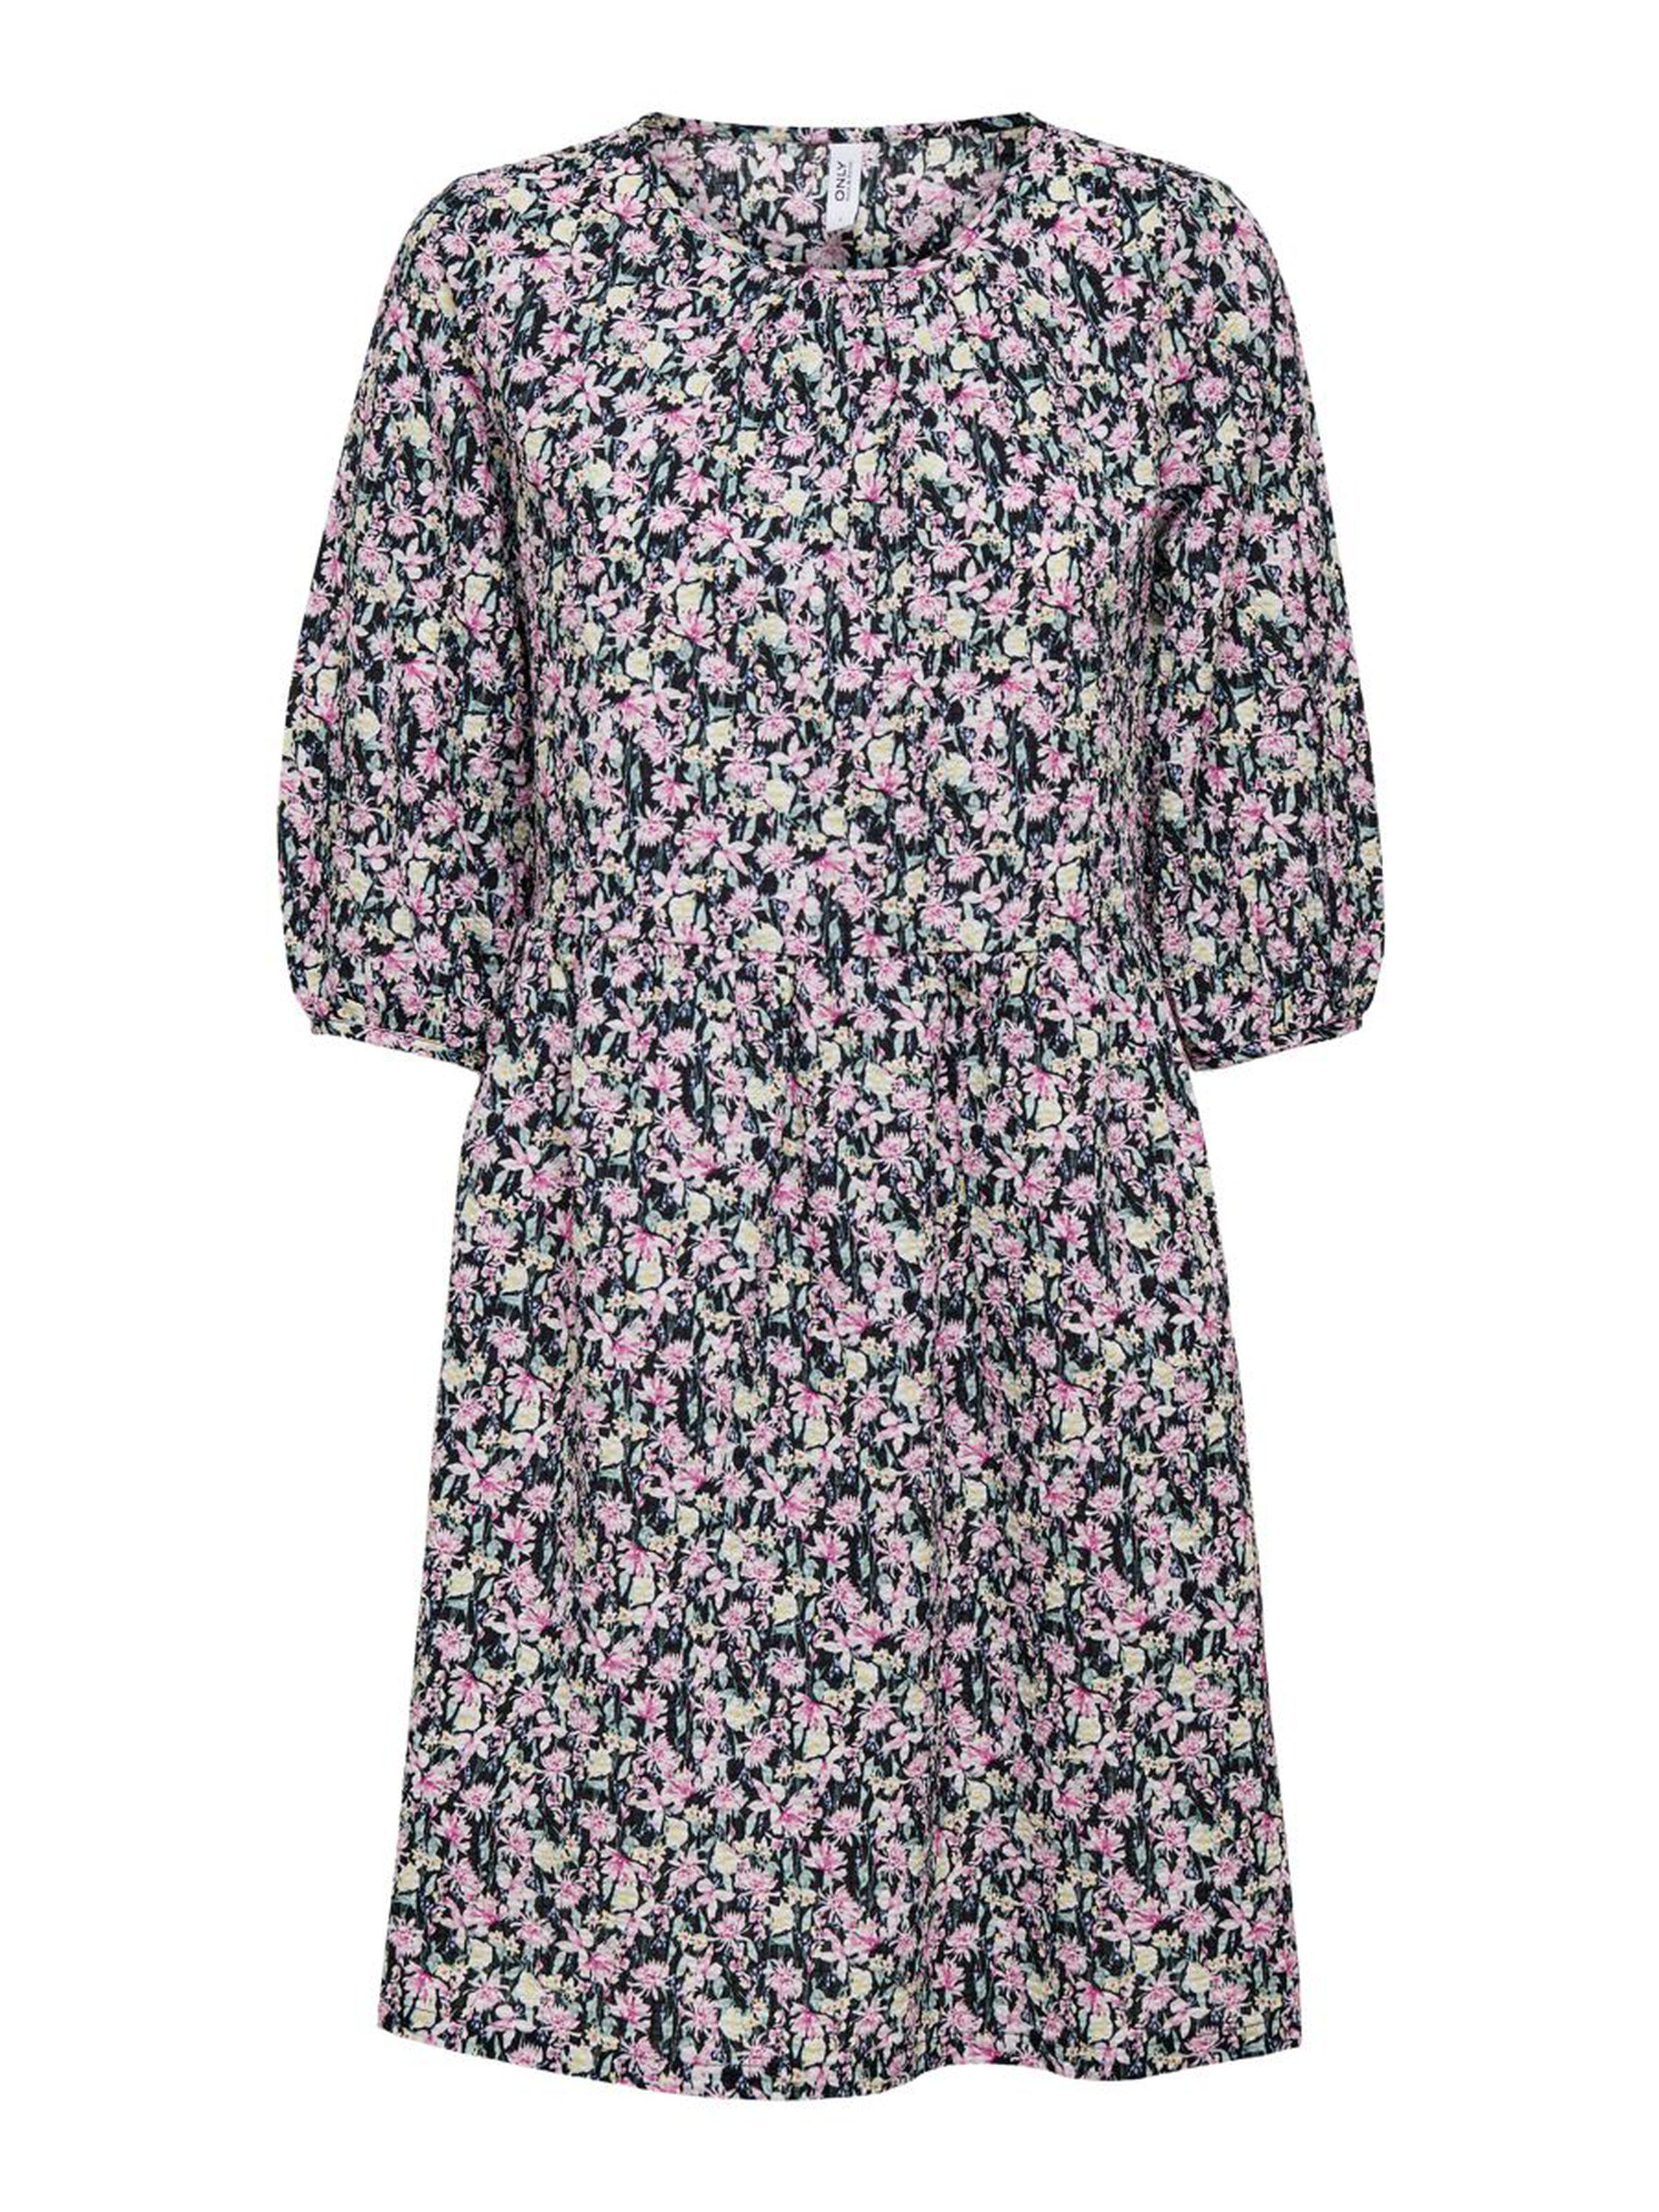 Only Lua 2/4 printet kjole, black/pink, small